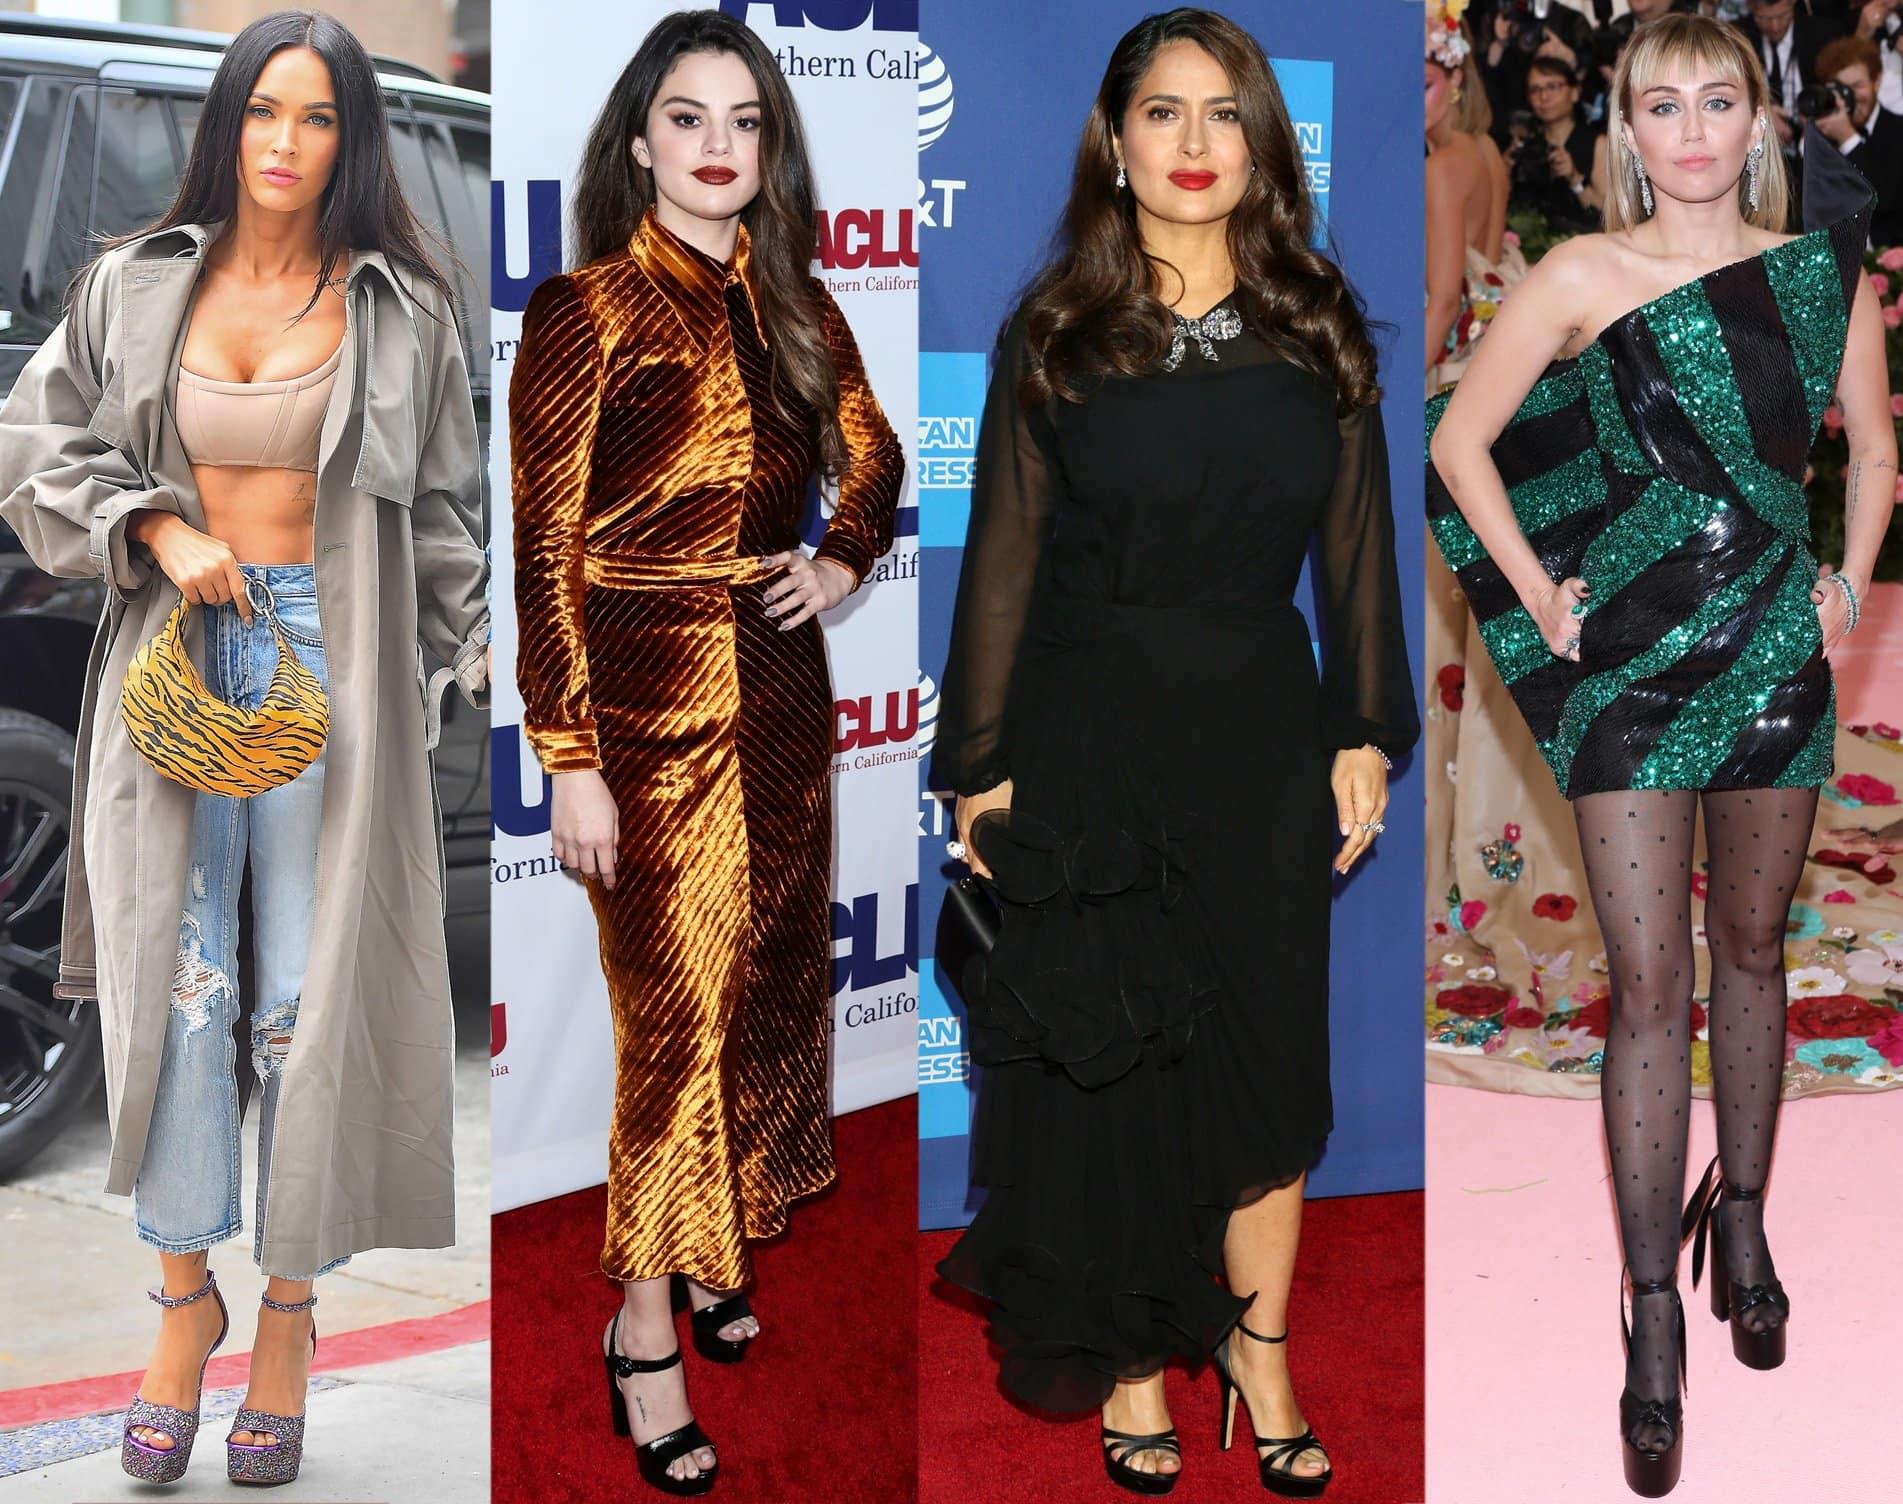 Megan Fox, Selena Gomez, Salma Hayek, and Miley Cyrus add height to their frame with platform heels